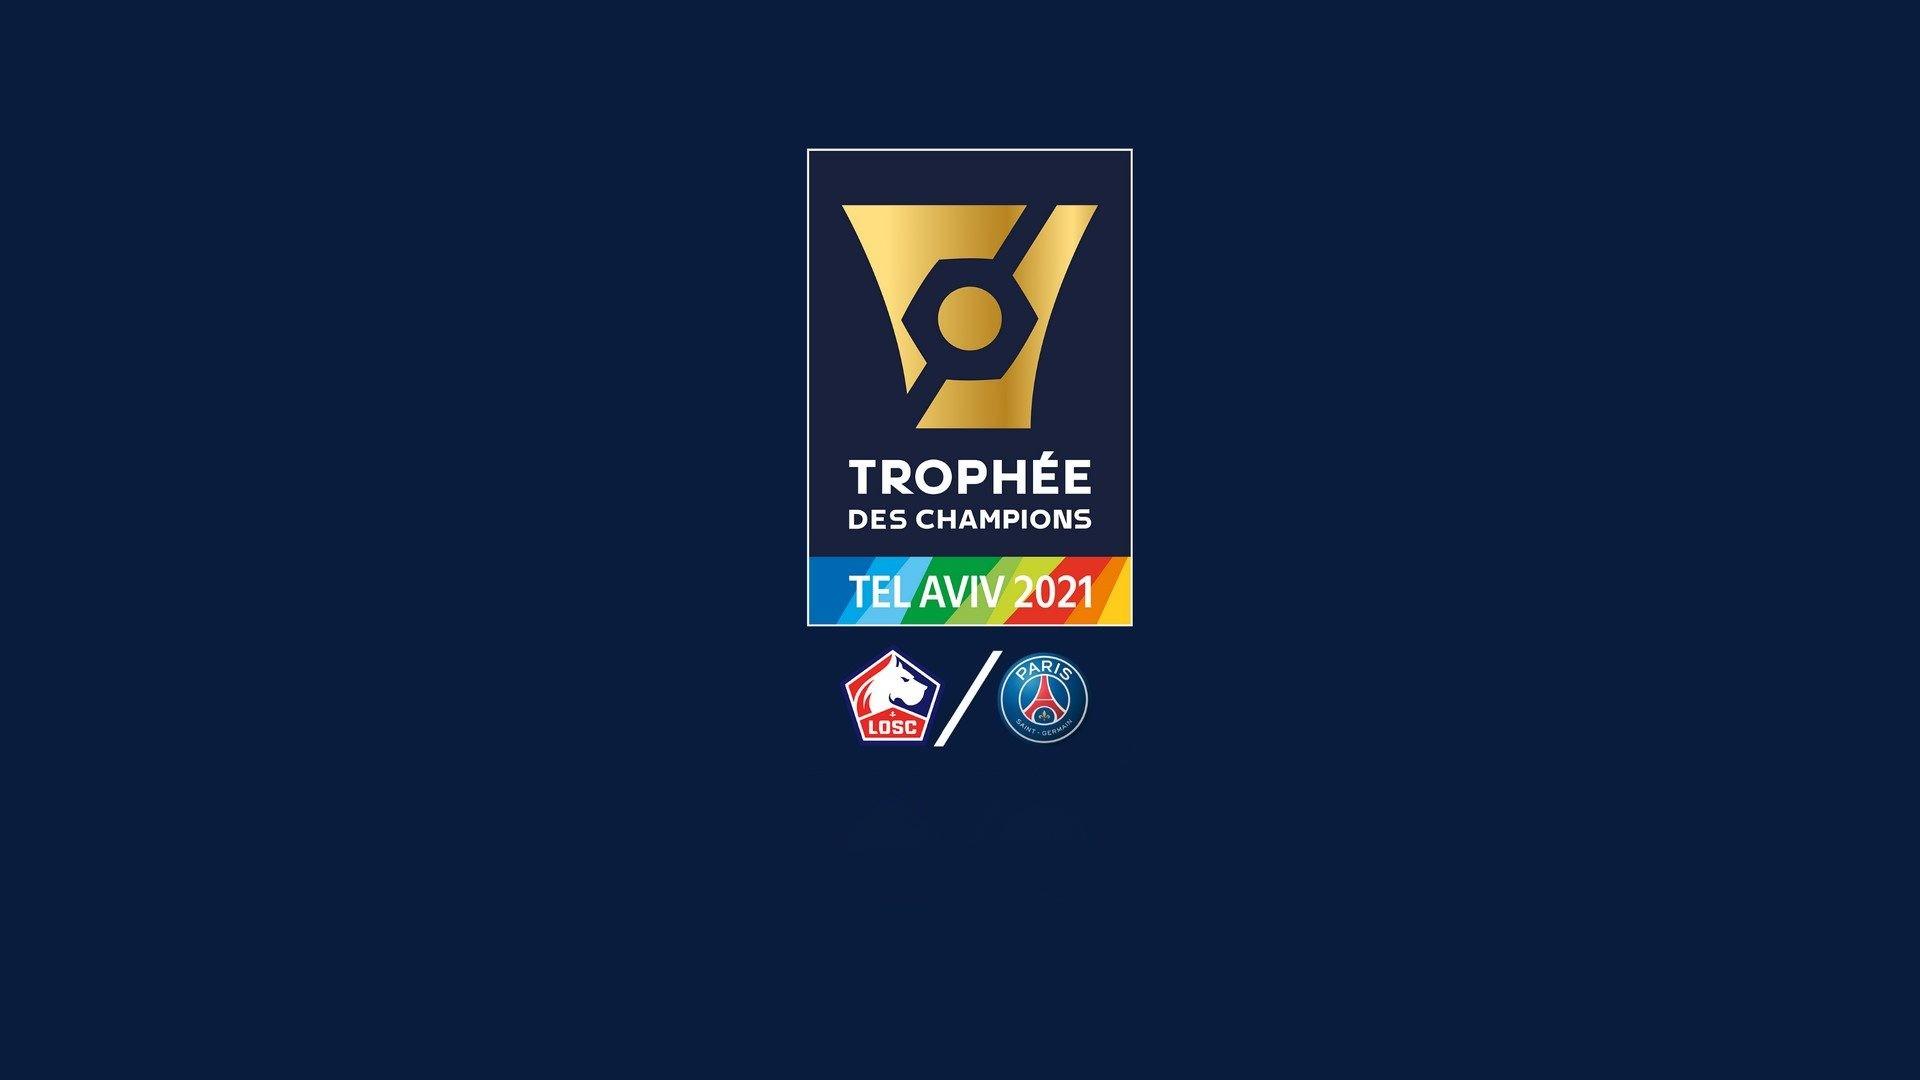 Football – Trophée des Champions 2021Tel Aviv (2) LFP